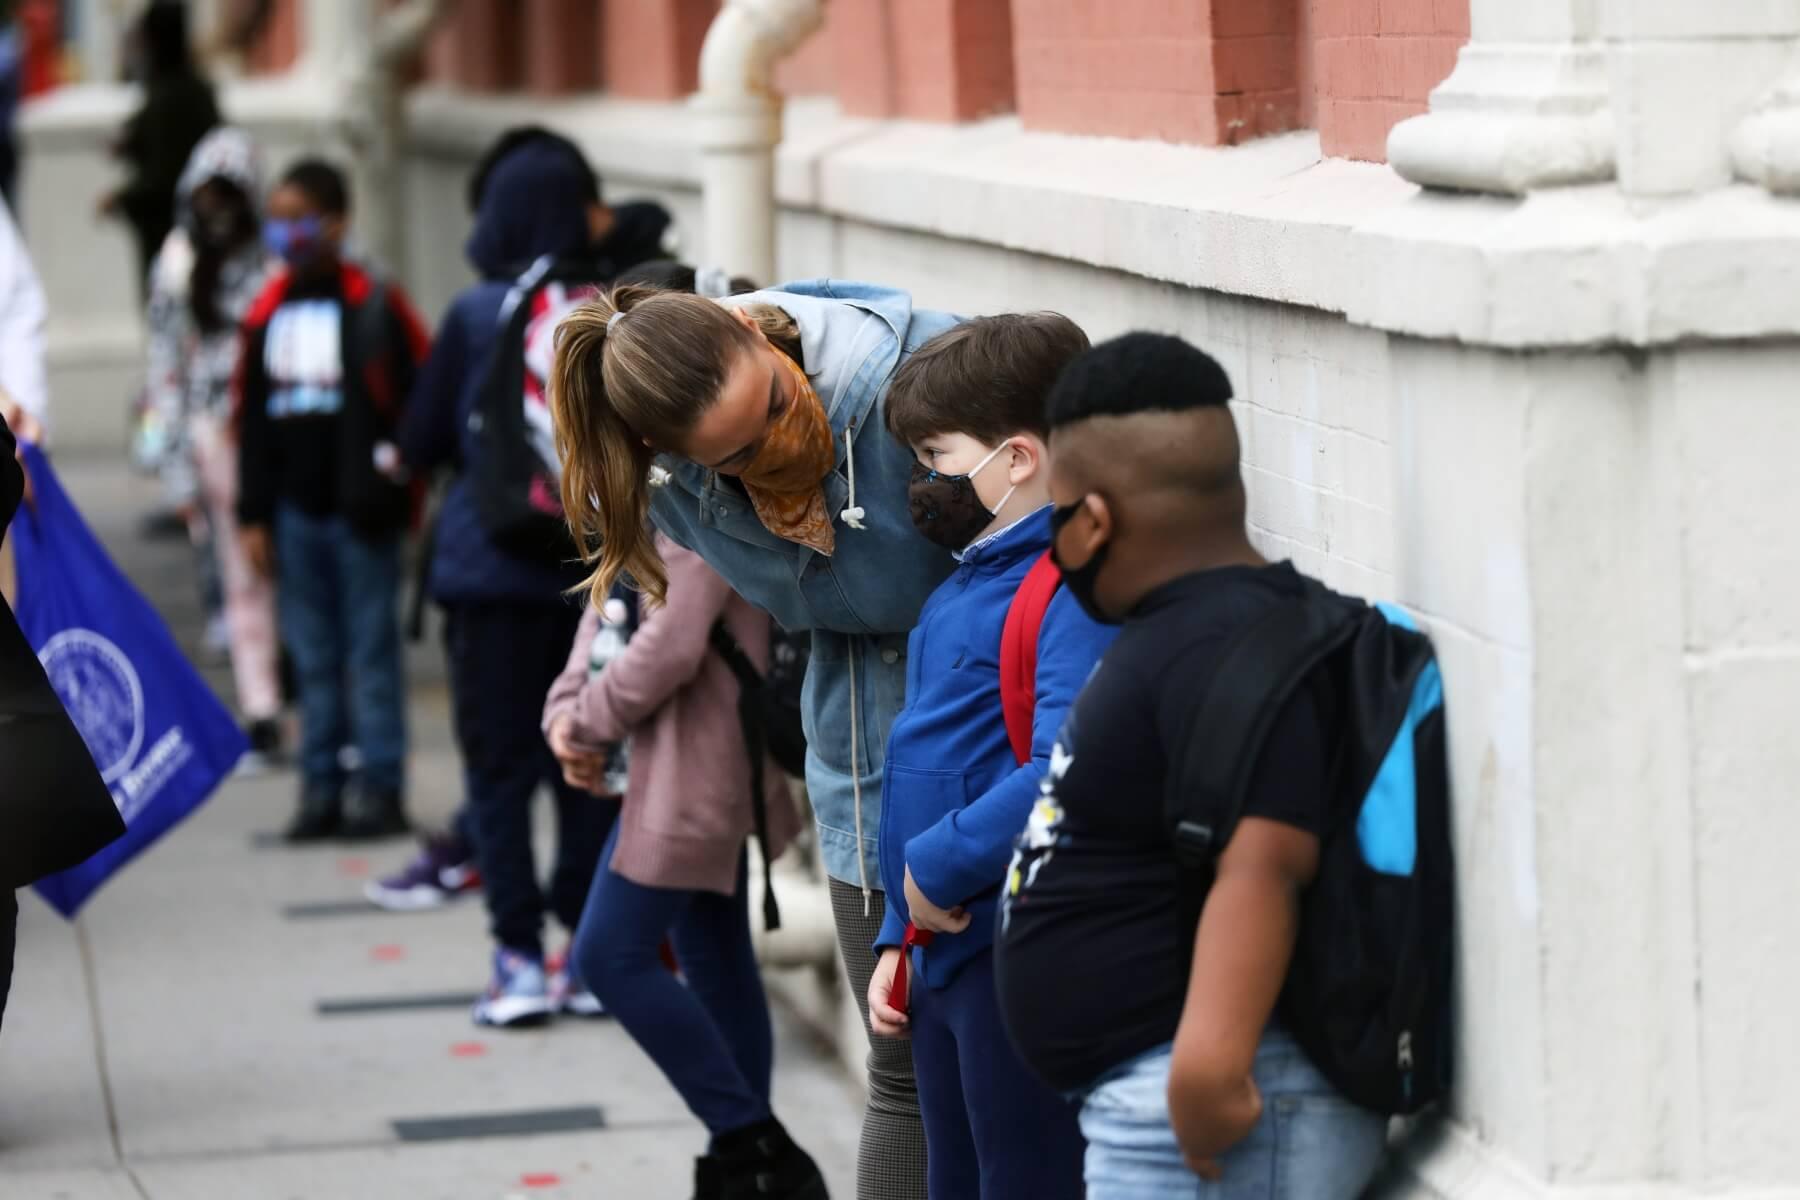 New York City to reopen primary schools despite virus surge